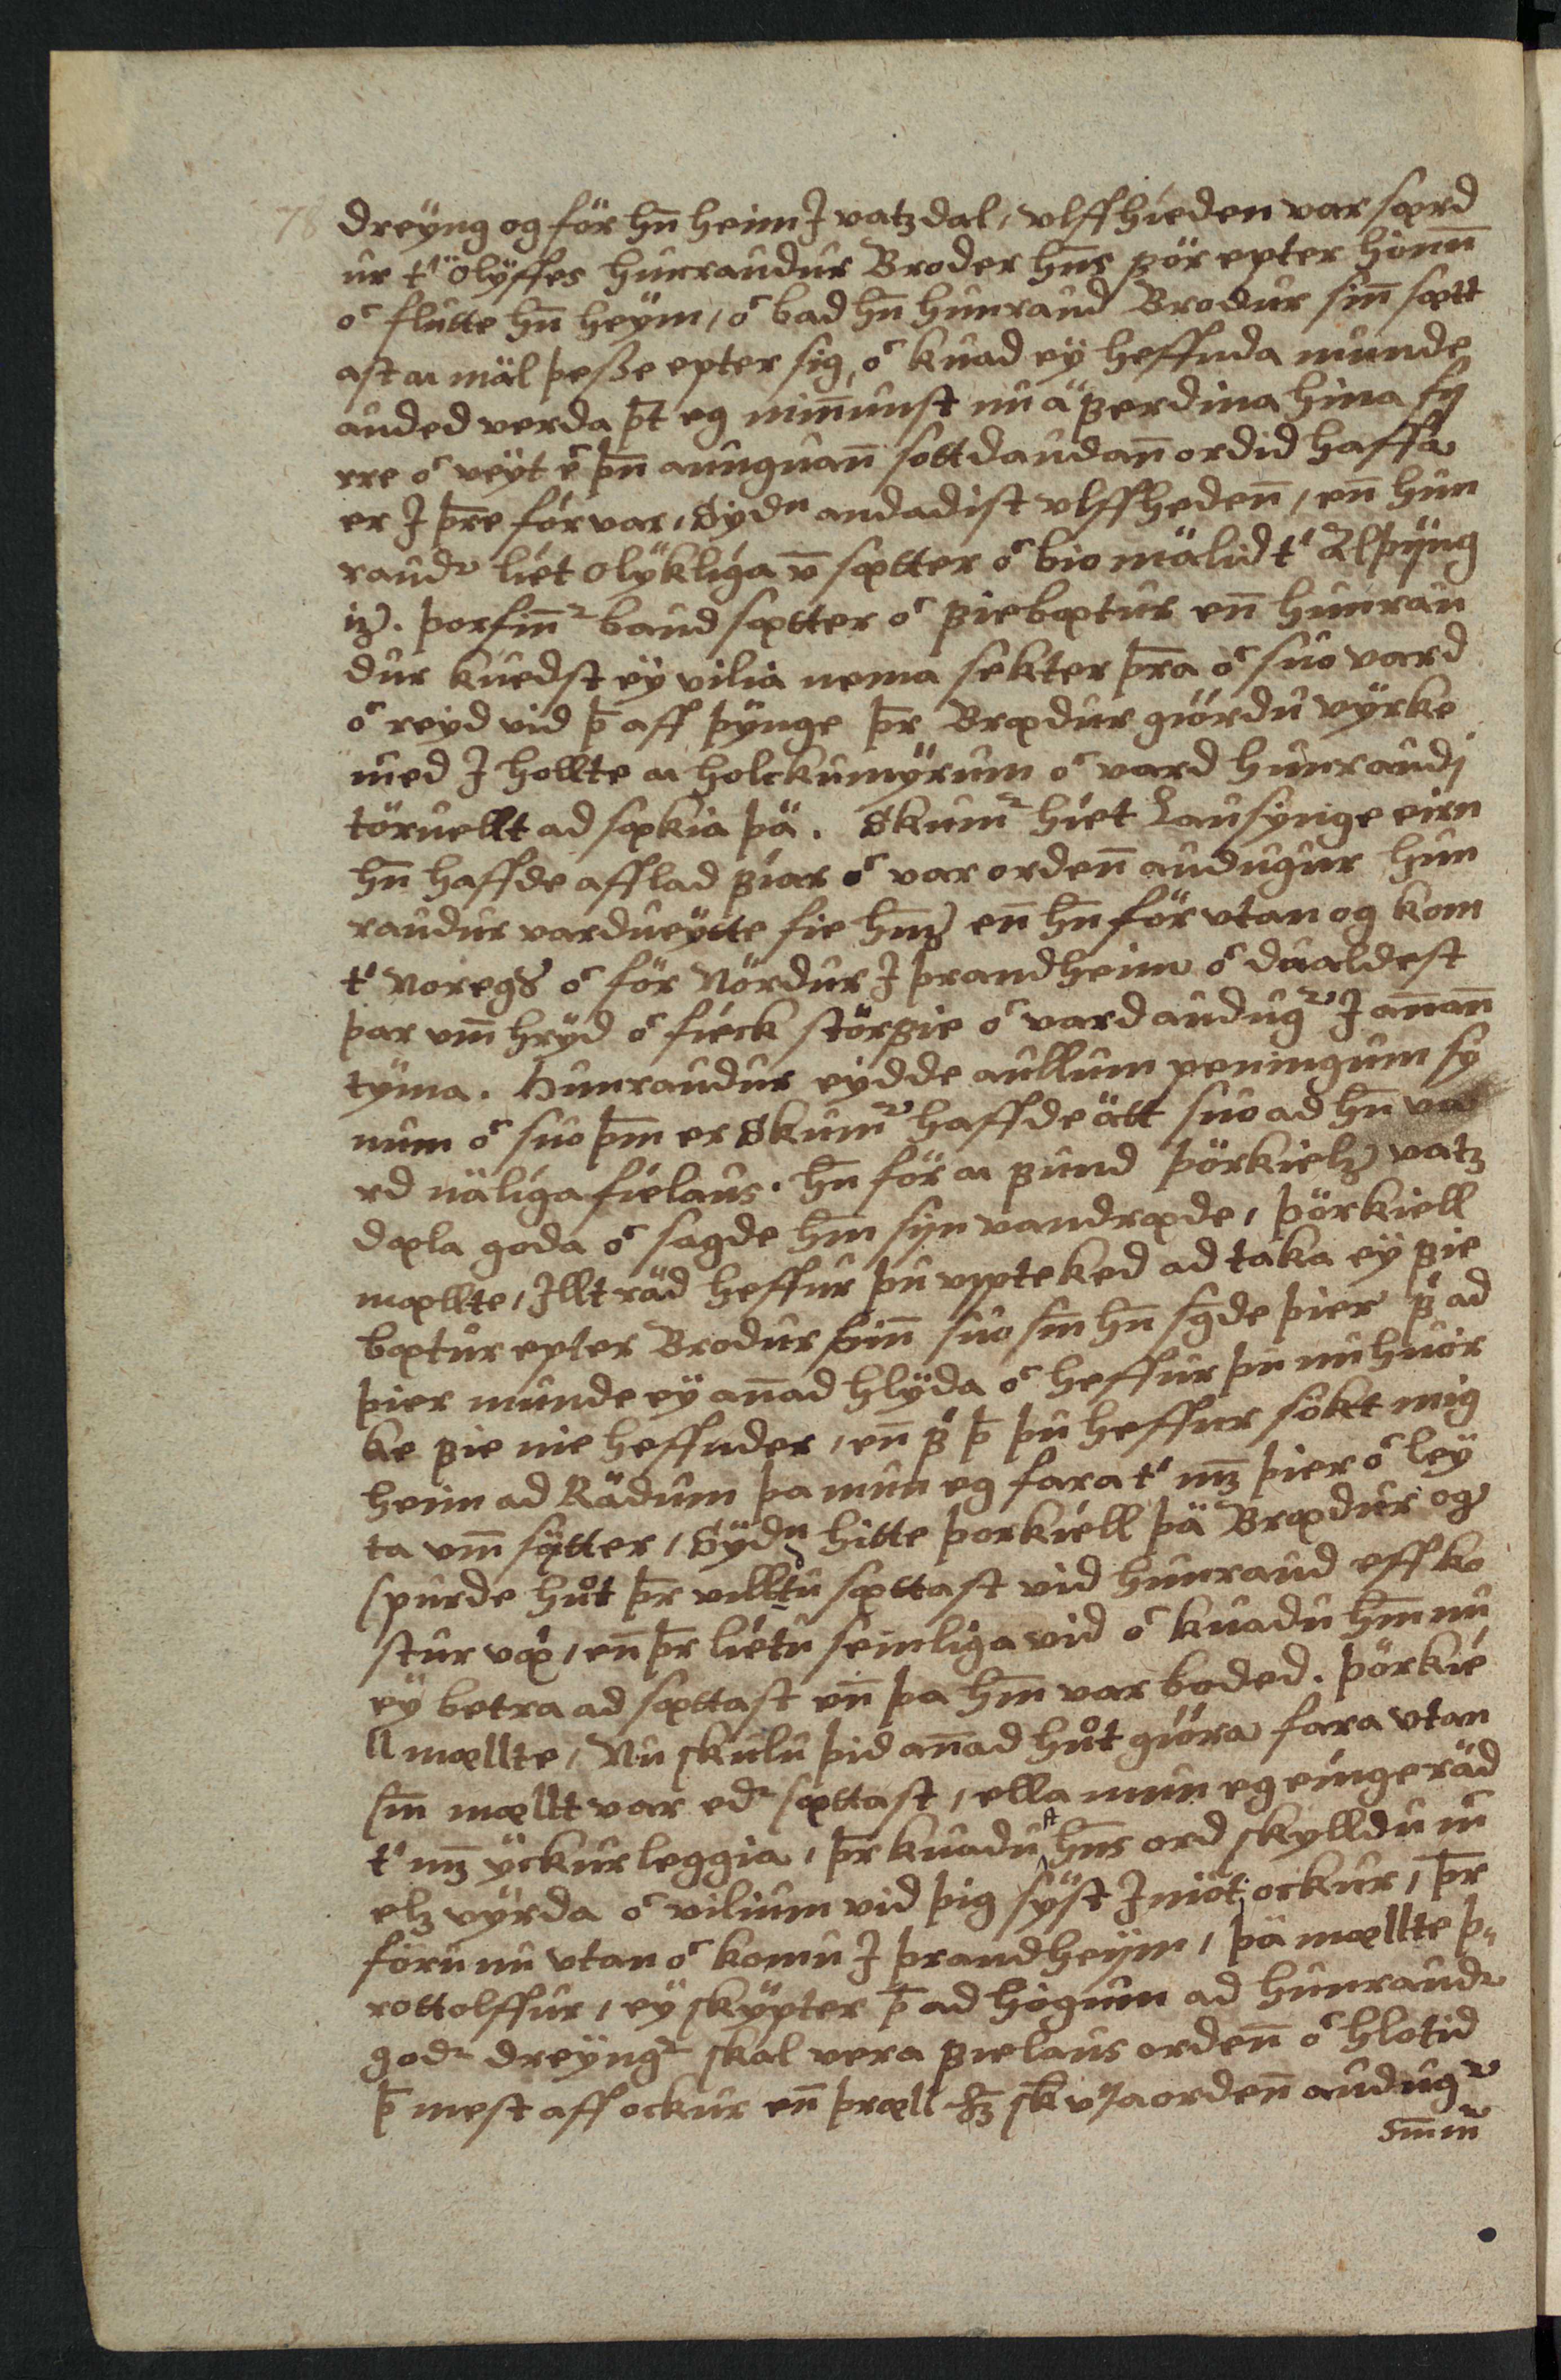 AM 138 fol - 39v